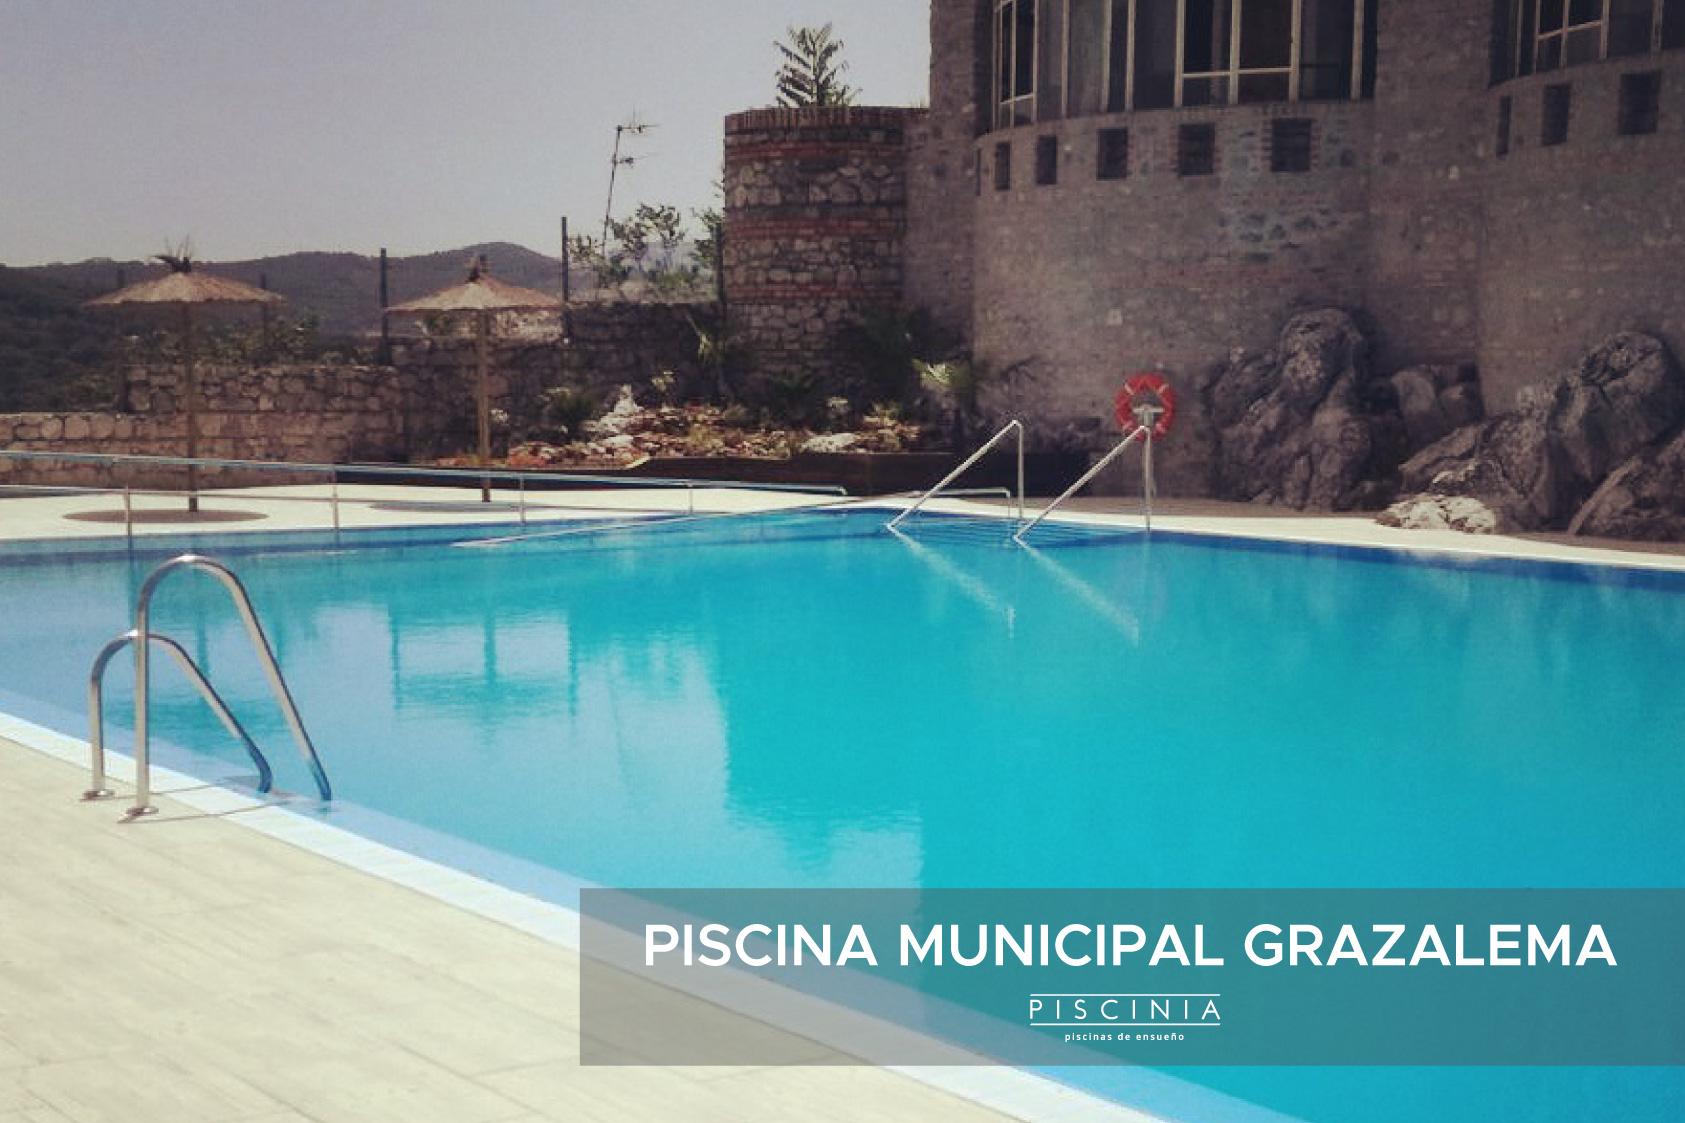 piscinamunicipalgrazalema12